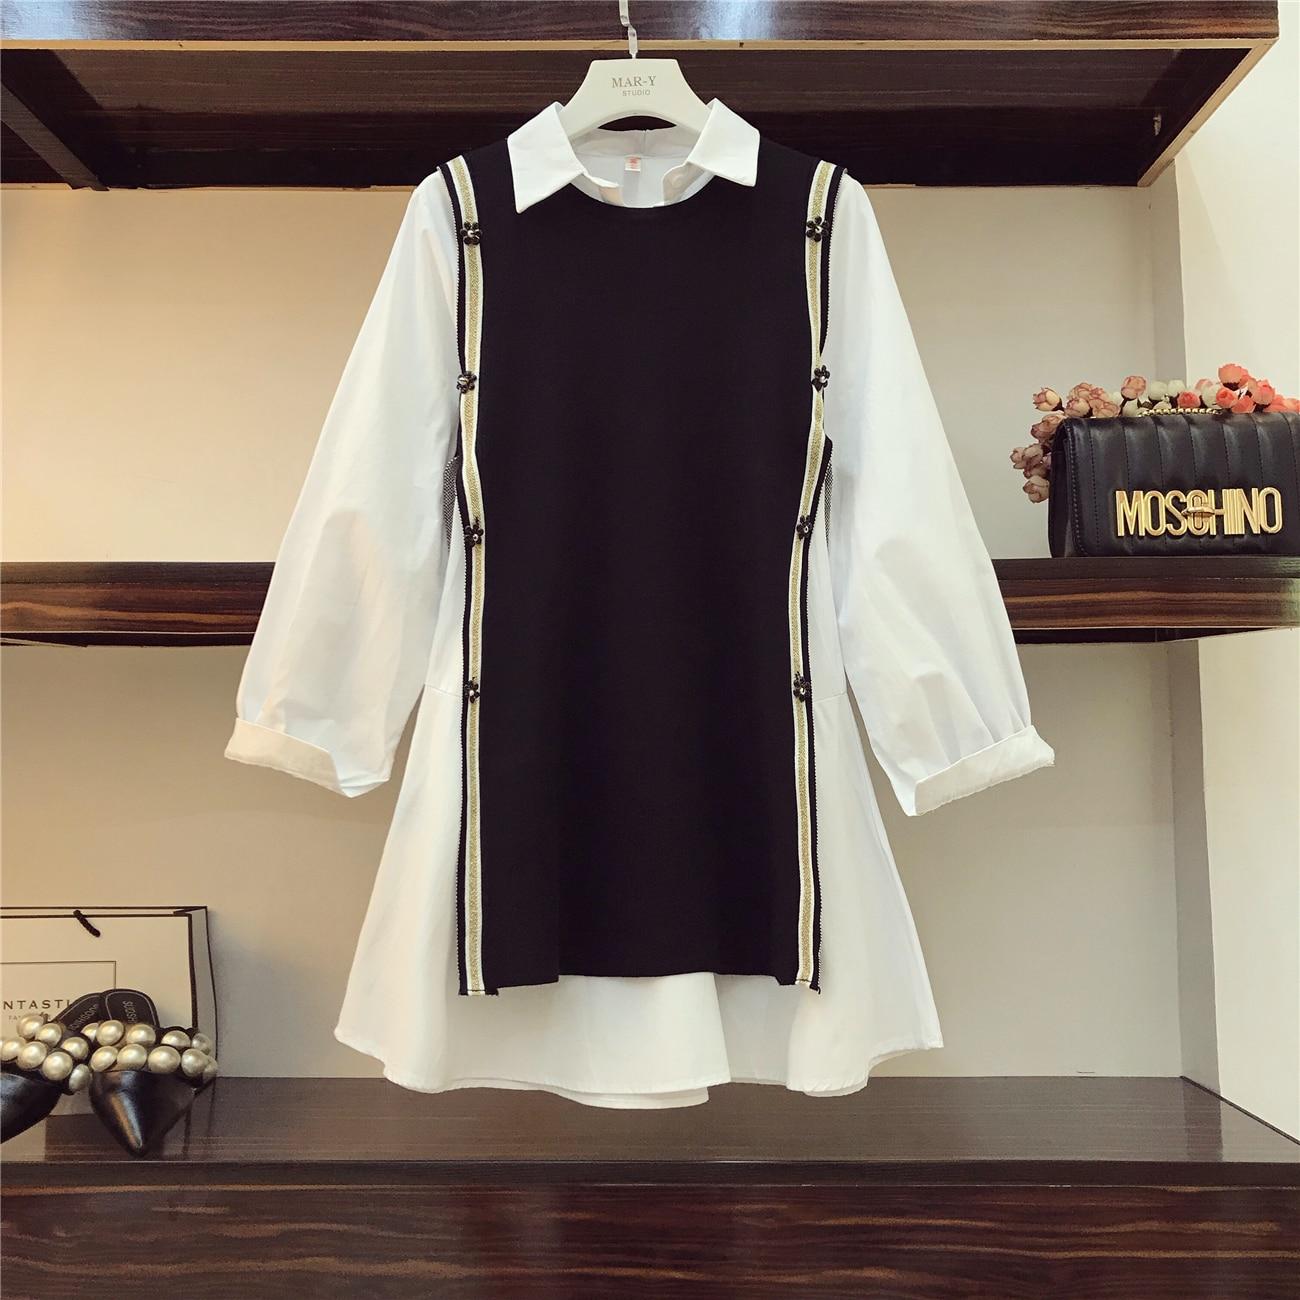 2018 Autumn Women's New Loose Long Shirt Dress + Knitted Vest Two-Piece Dress Sets Student Vestidos Dress Suit